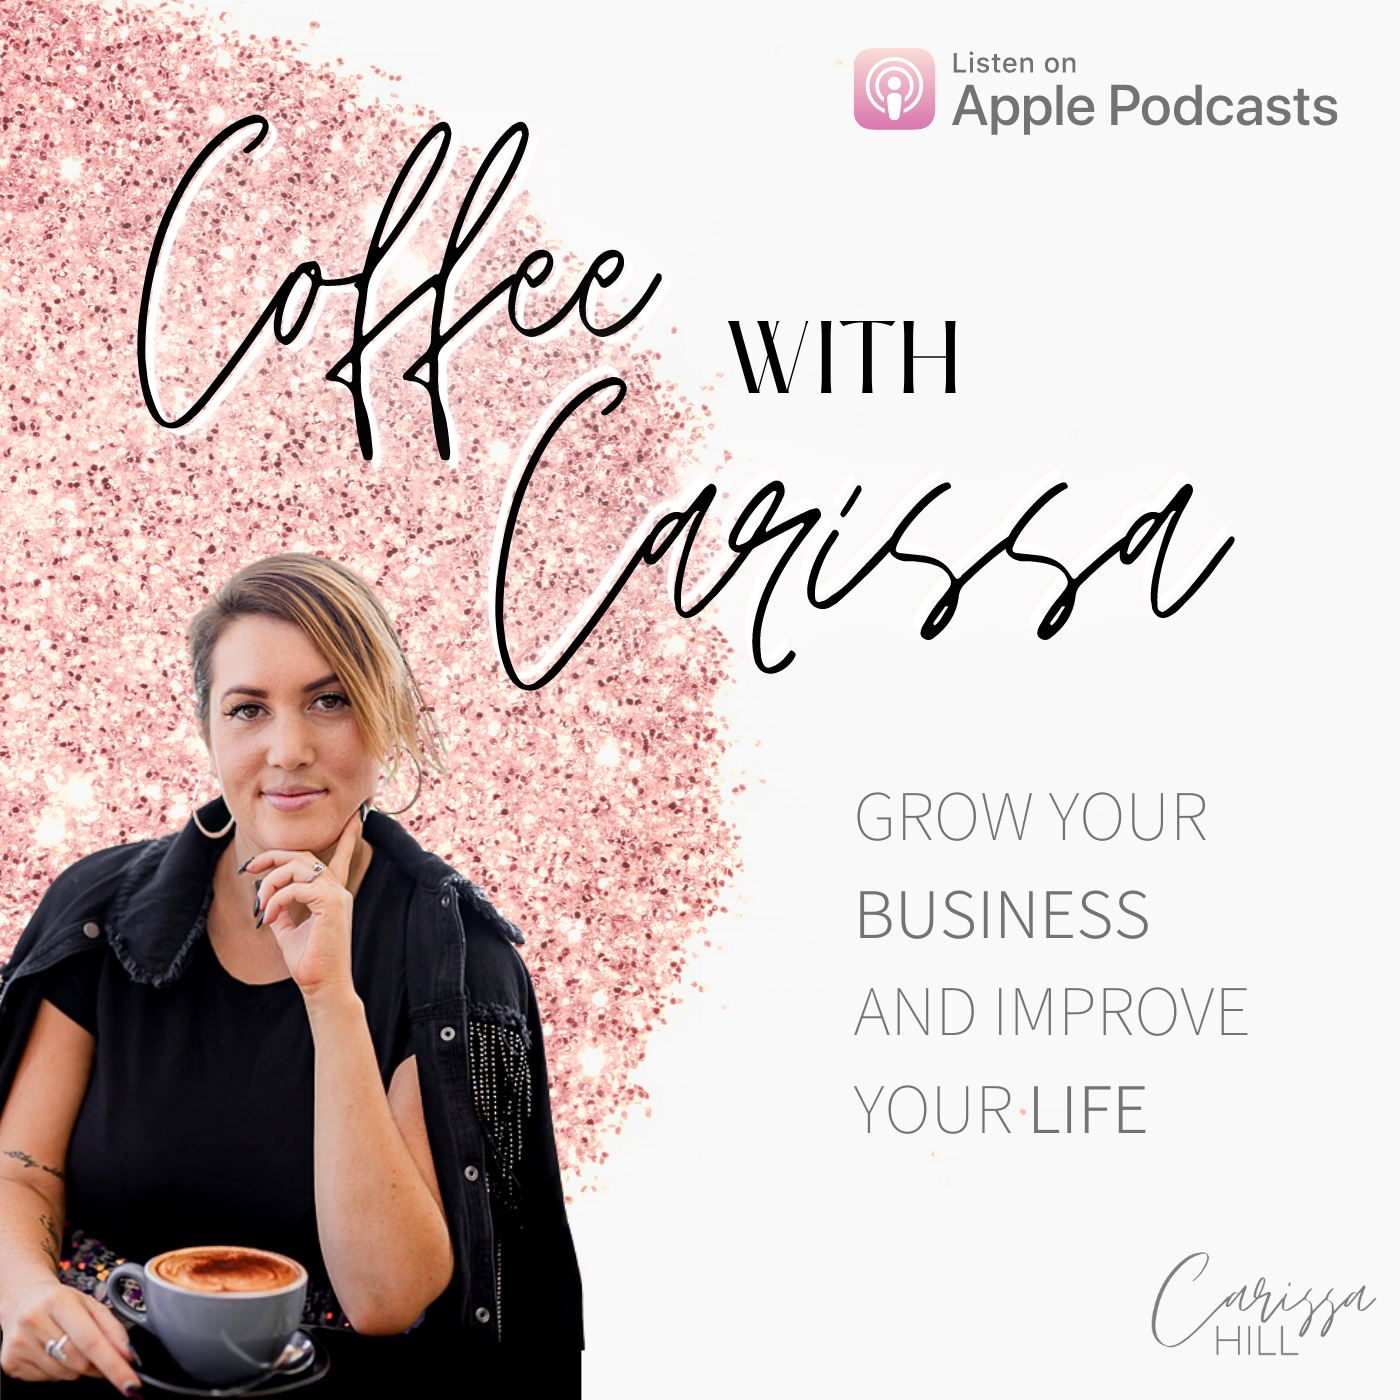 Carissa Hill Podcast